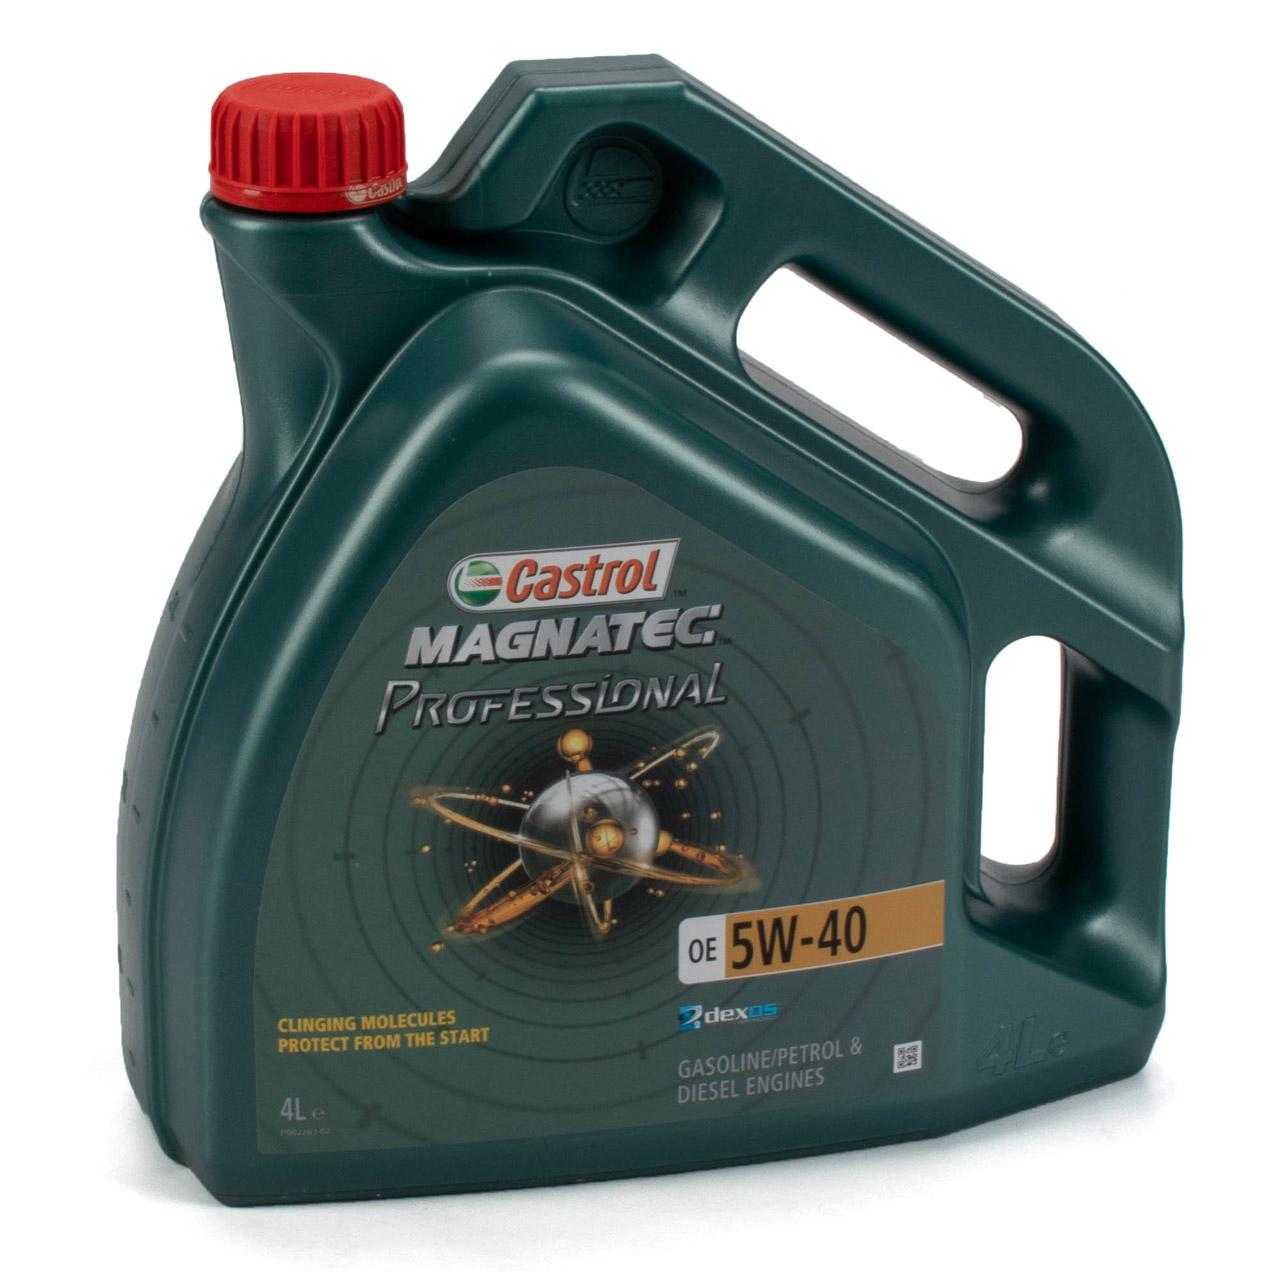 CASTROL Magnatec Professional Motoröl OE 5W40 dexos2 Ford WSS-M2C917-A - 7 Liter